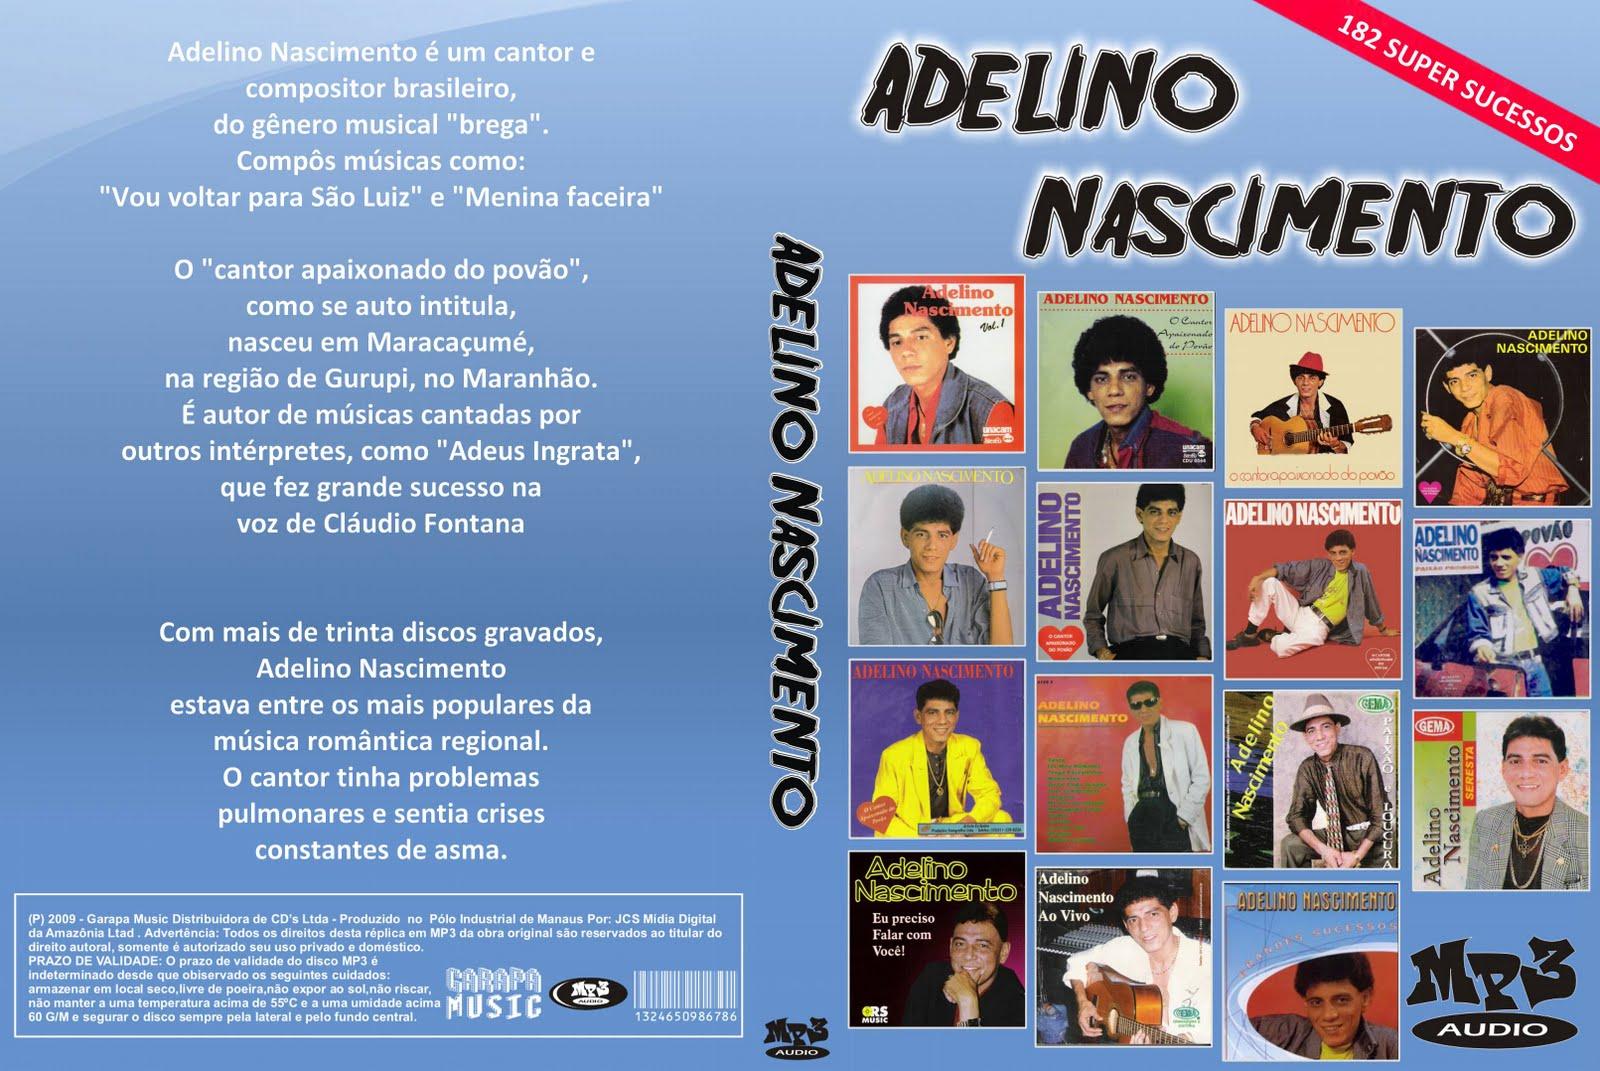 NASCIMENTO MP3 BAIXAR ADELINO